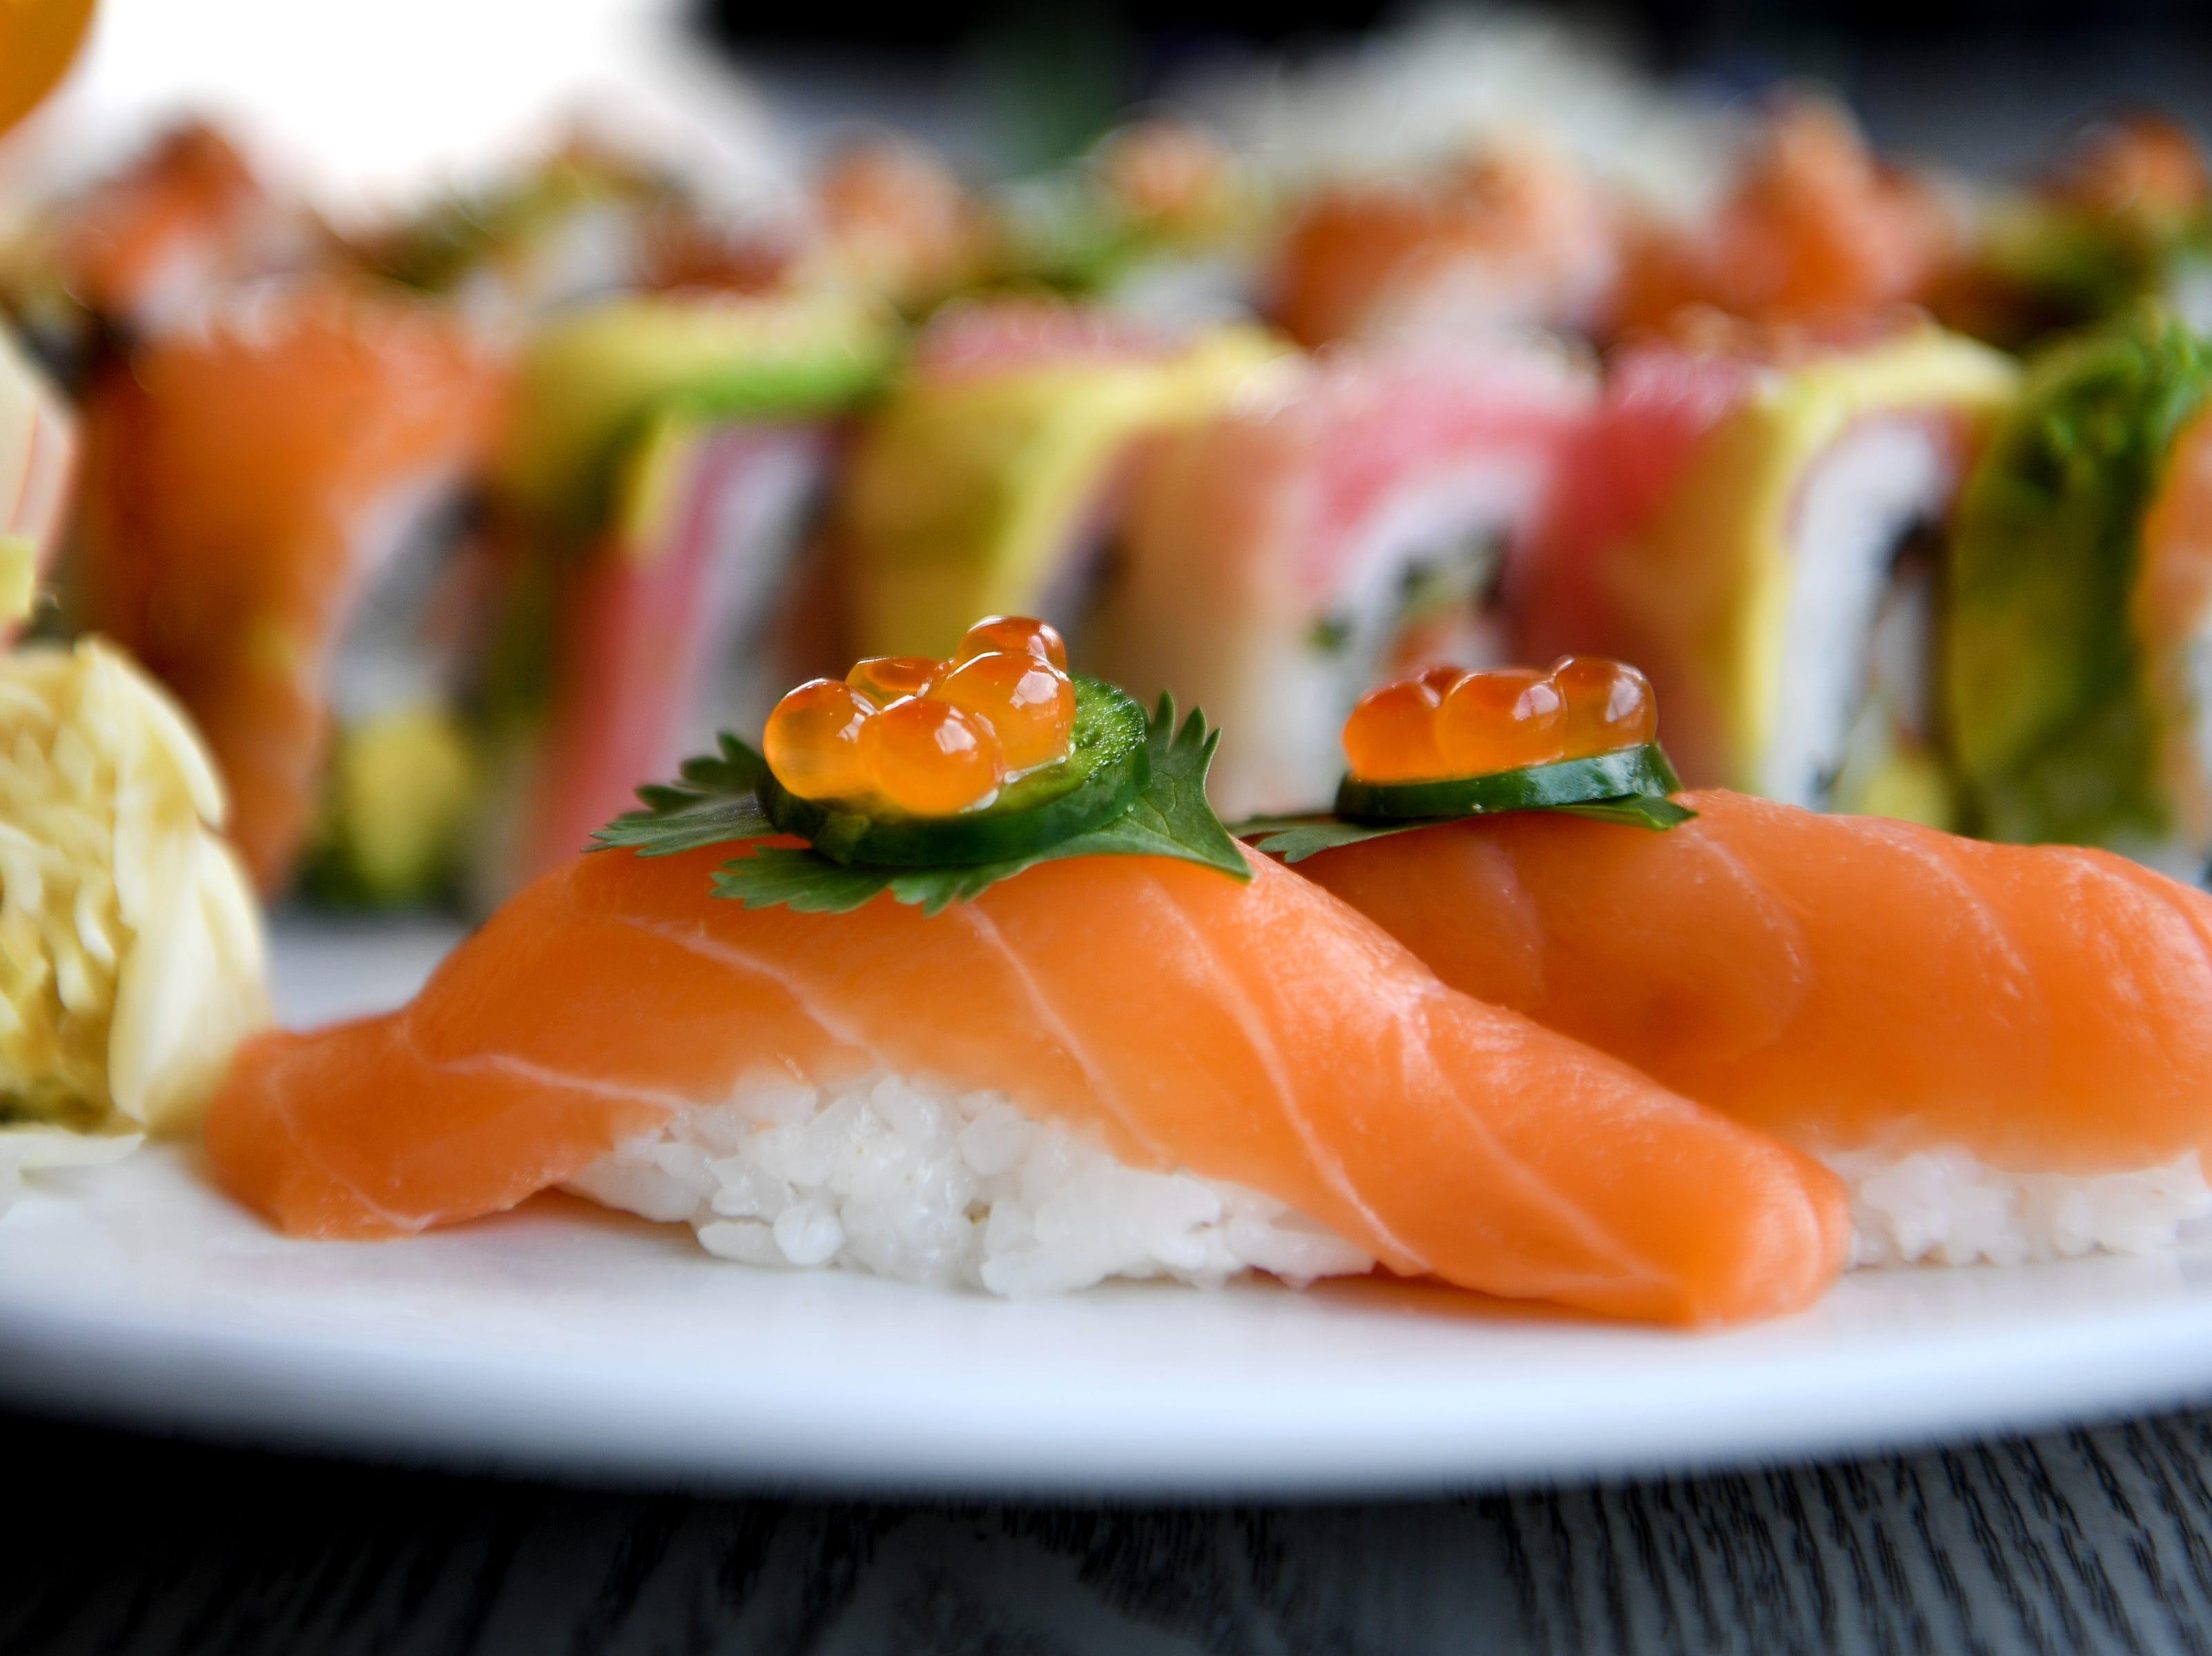 The Sake tori sushi at Takosushi features fresh salmon and is served a la carte.